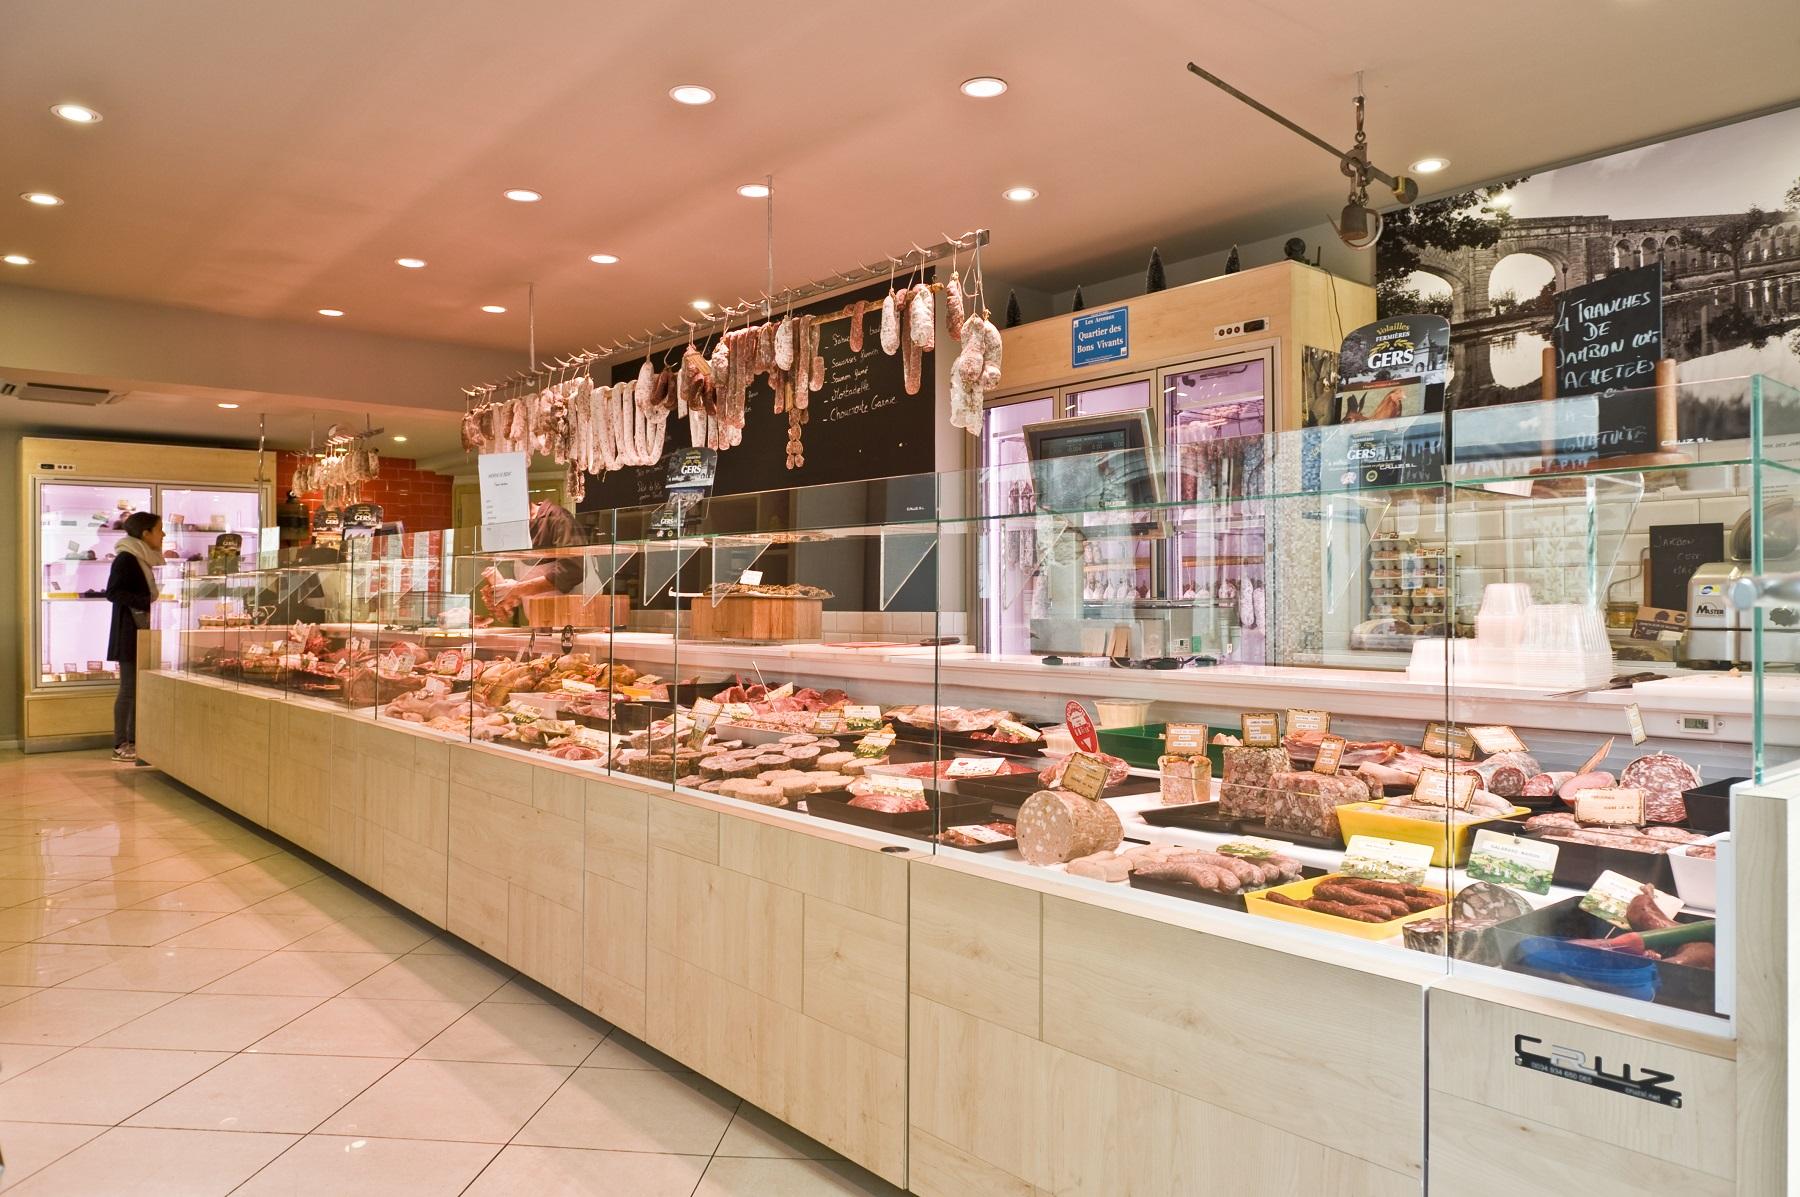 NAKIDE-Boucherie-Patrick Puel-agencement-vitrine-refrigeree-cruz-viande